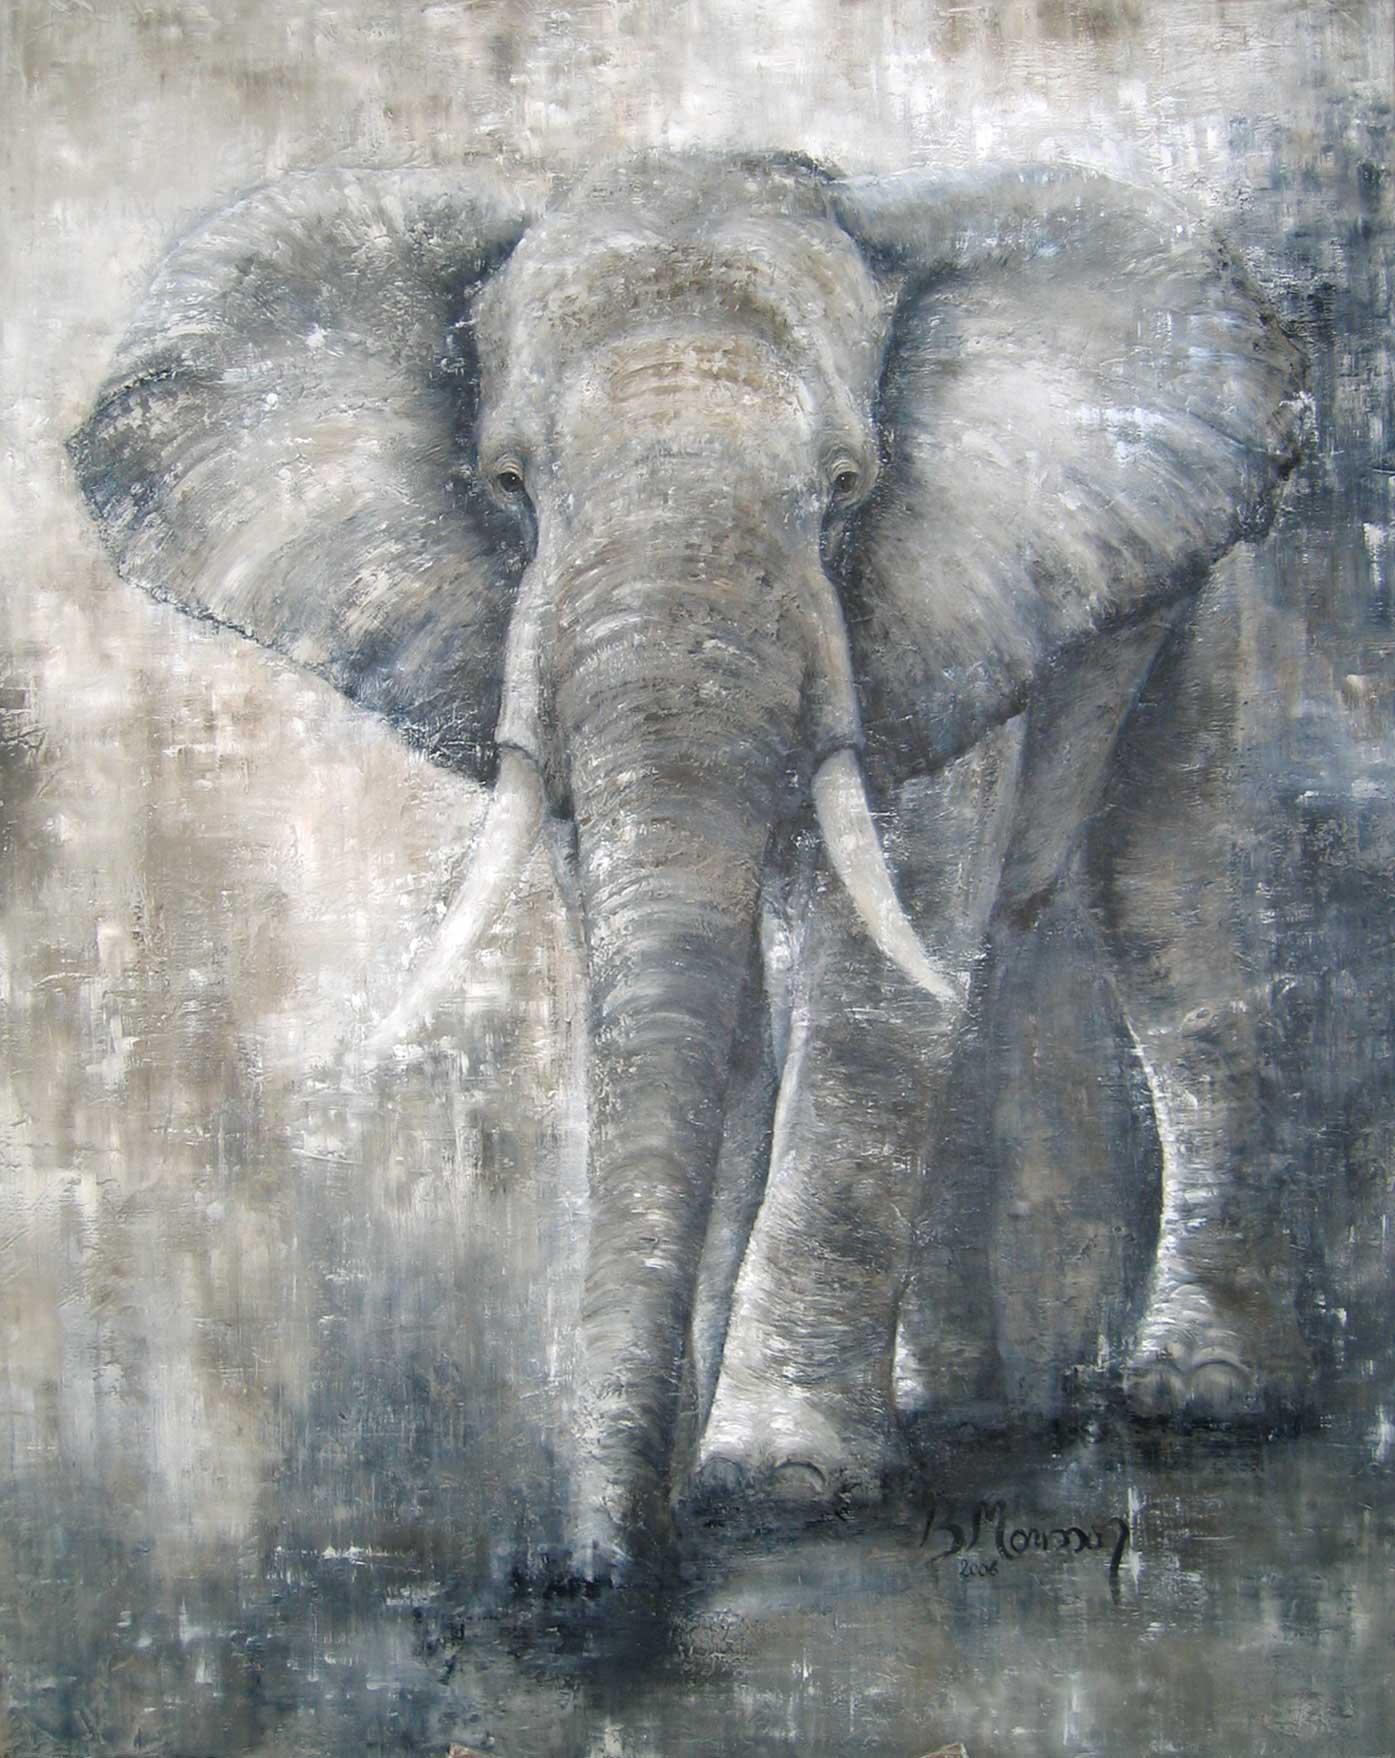 Elephant (c) Brigitte Morisson